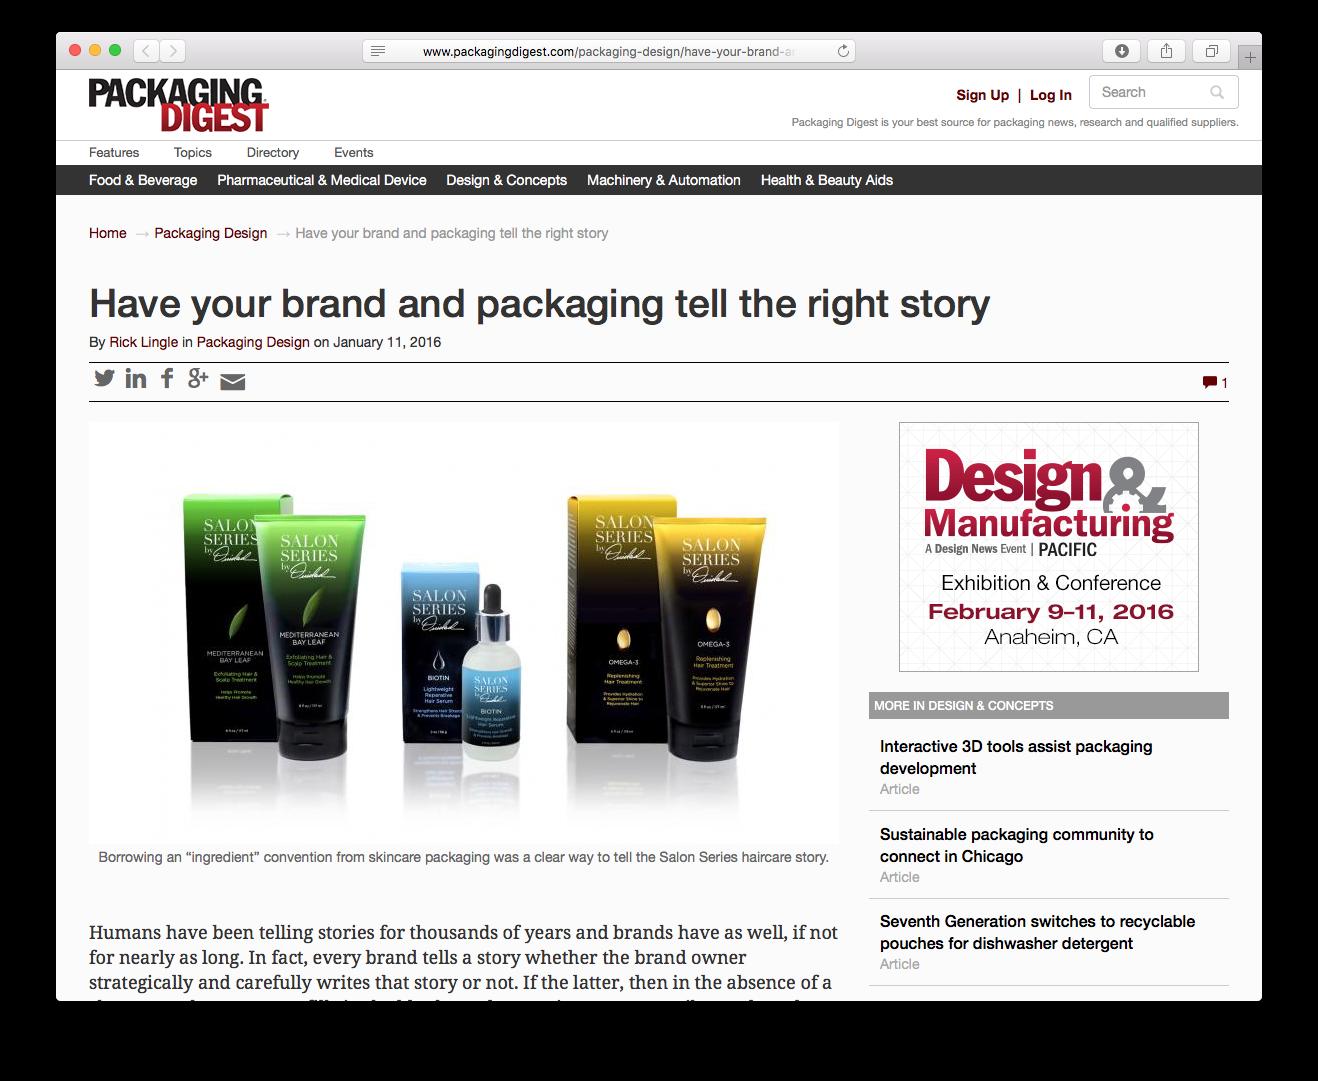 Sheri Koetting Interviewed for Packaging Digest